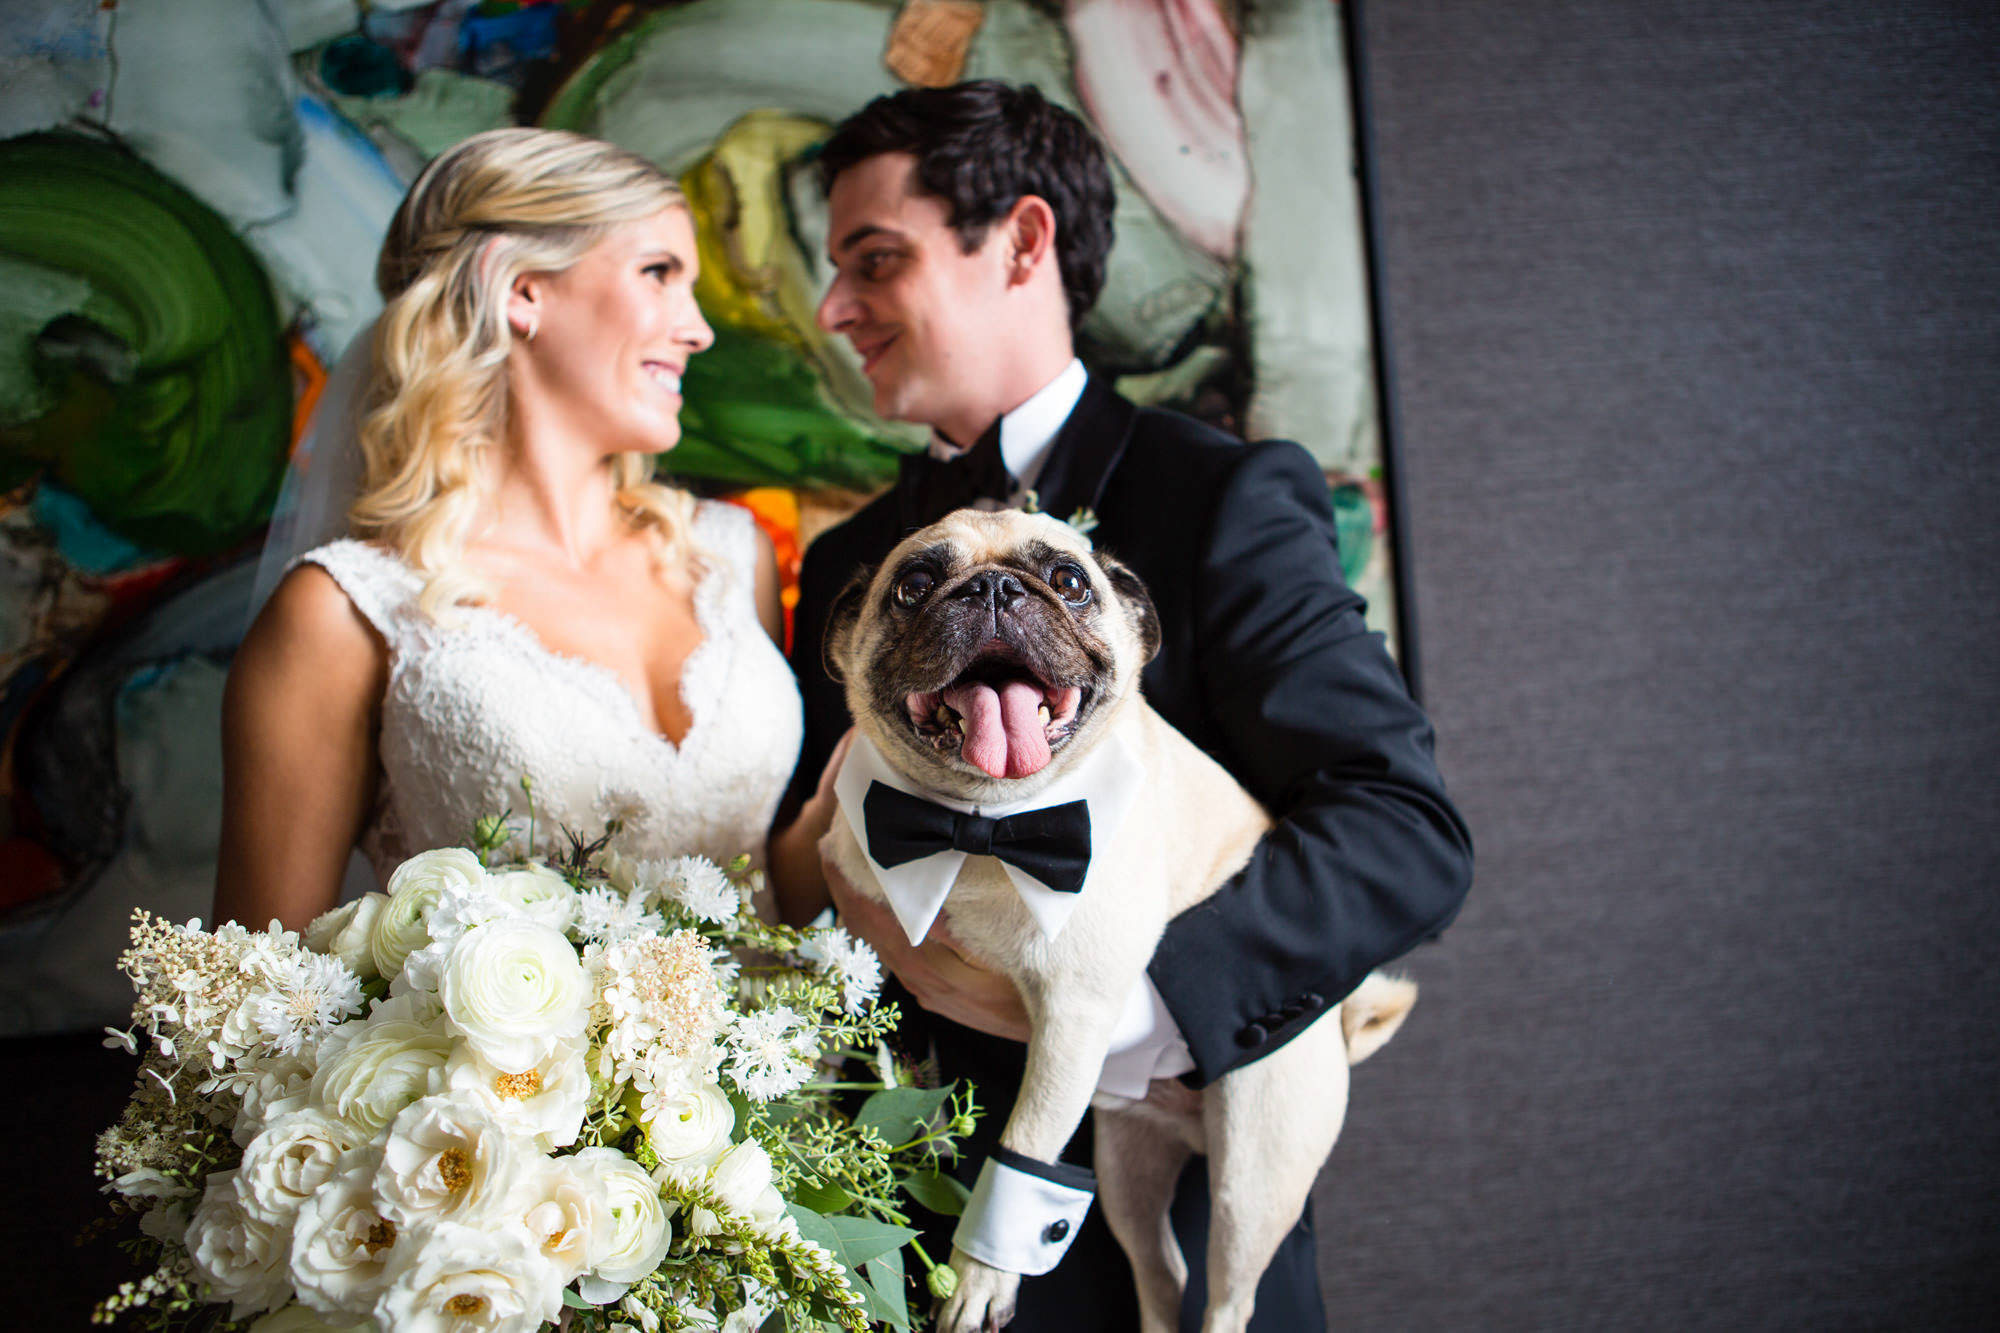 pug-puppy-in-tuxedo-bowtie-with-couple-worlds-best-wedding-photos-san-juan-island-photographers-la-vie-photo